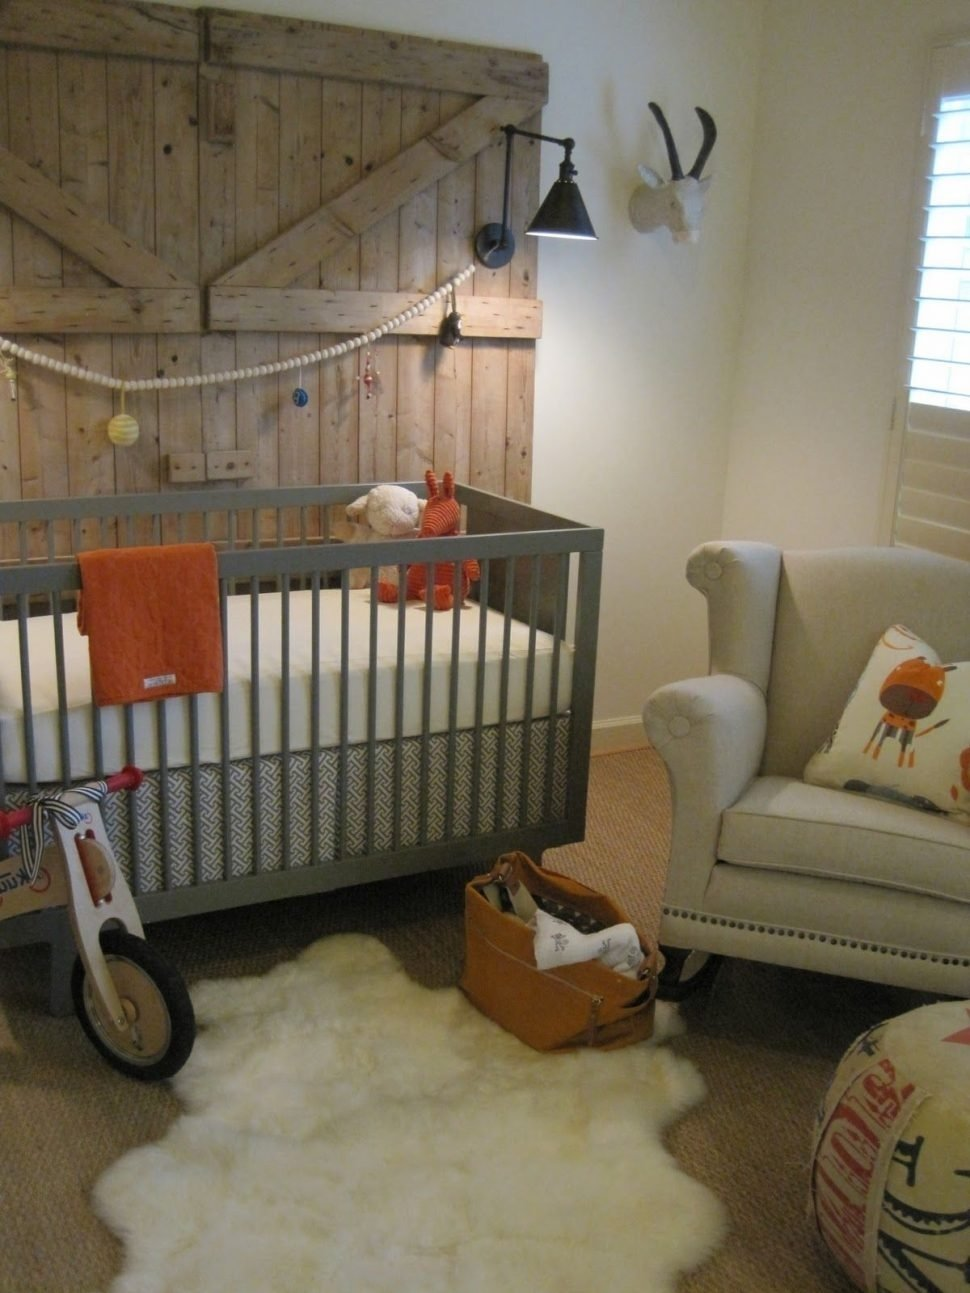 10 Gorgeous Unique Baby Boy Nursery Ideas bedroom unique baby boy bedroom ideas design nursery decor 2020